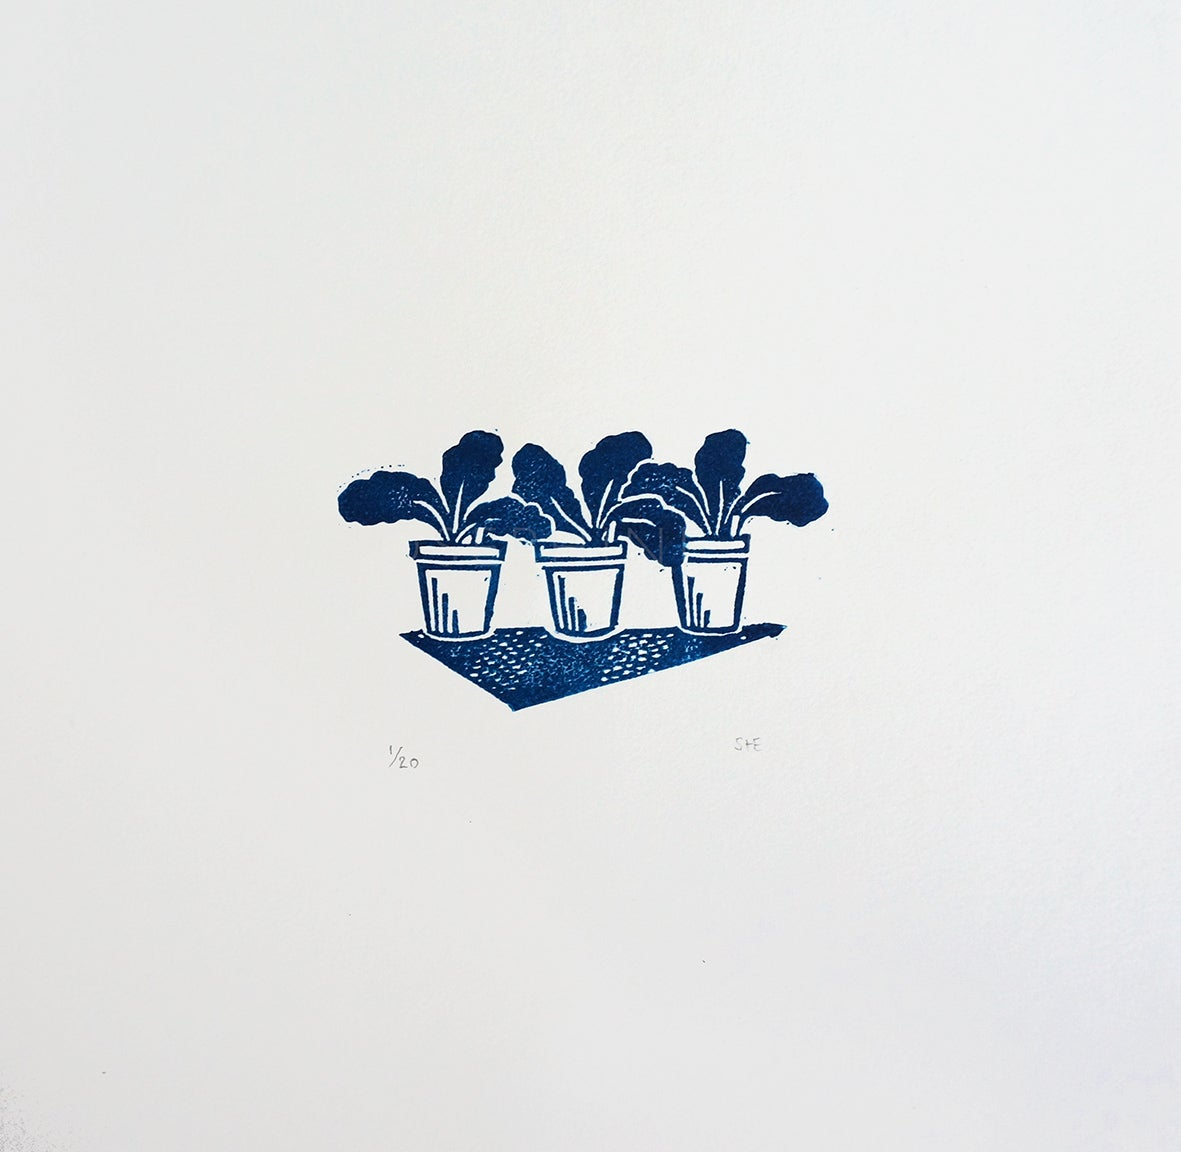 Image of 'Potting Up' - Linocut Print